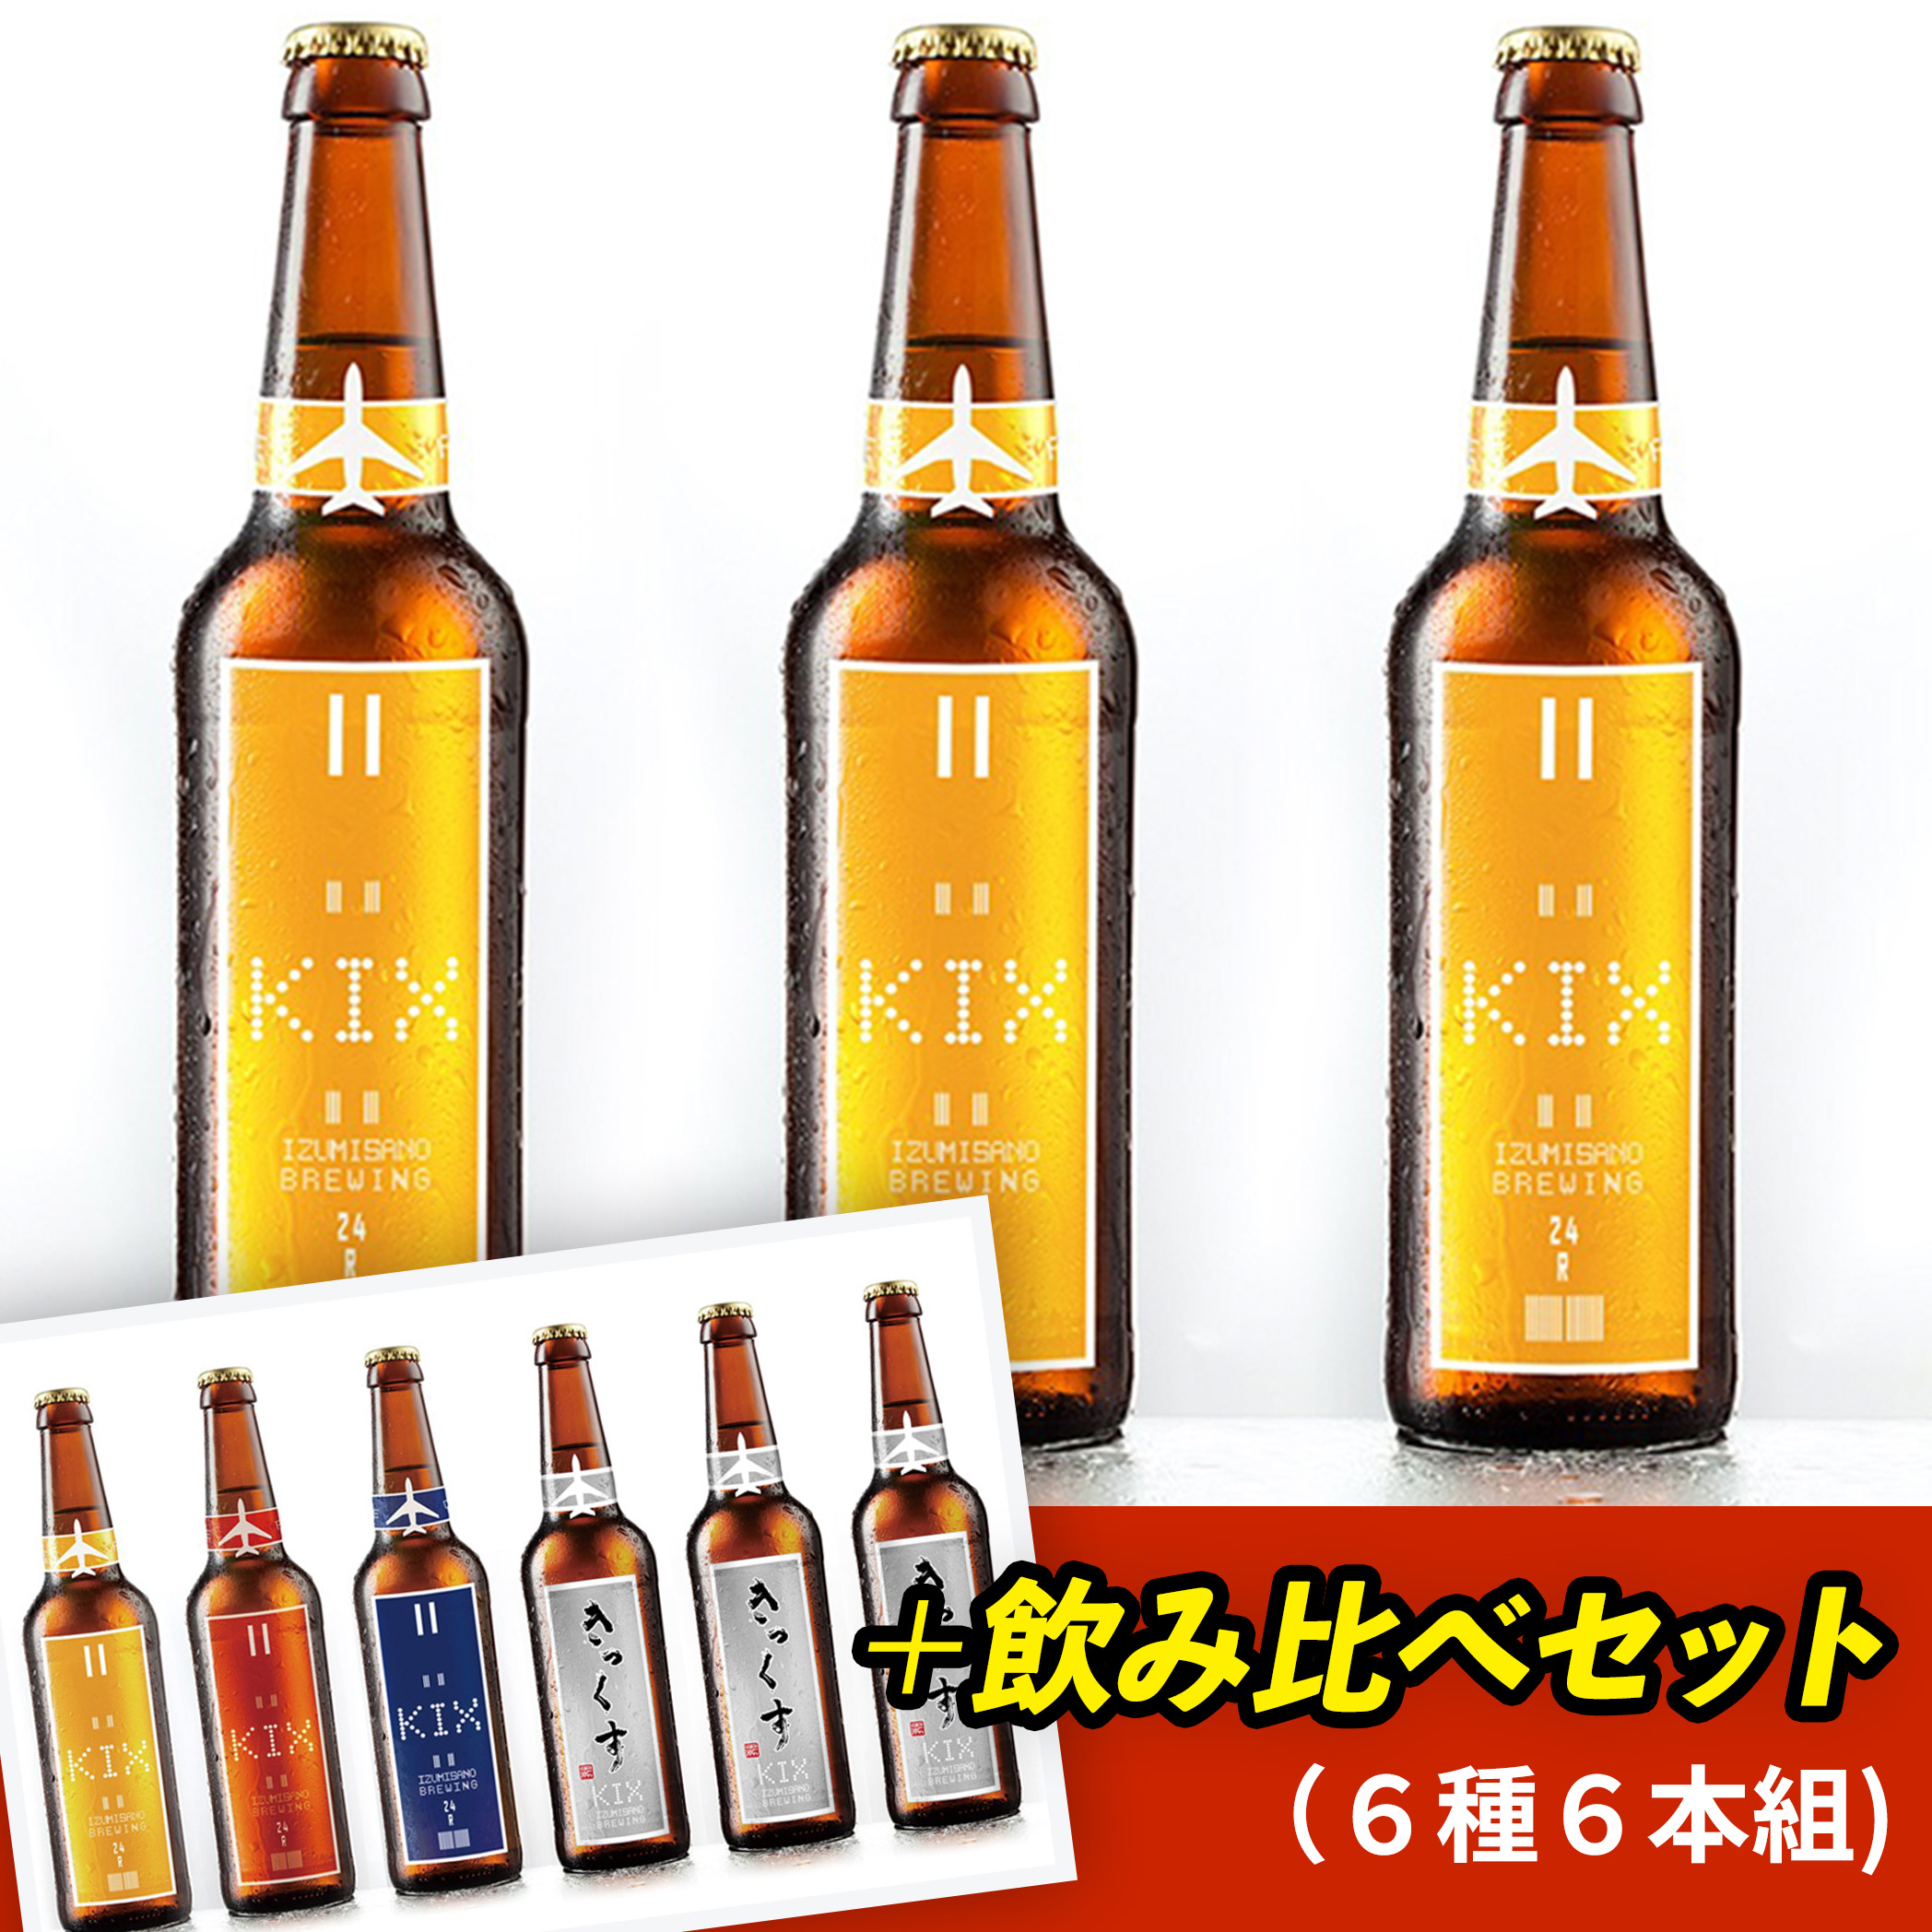 020C092 【期間限定】KIX BEER飲み比べセット18本(ヴァイツェン12本+6種6本)